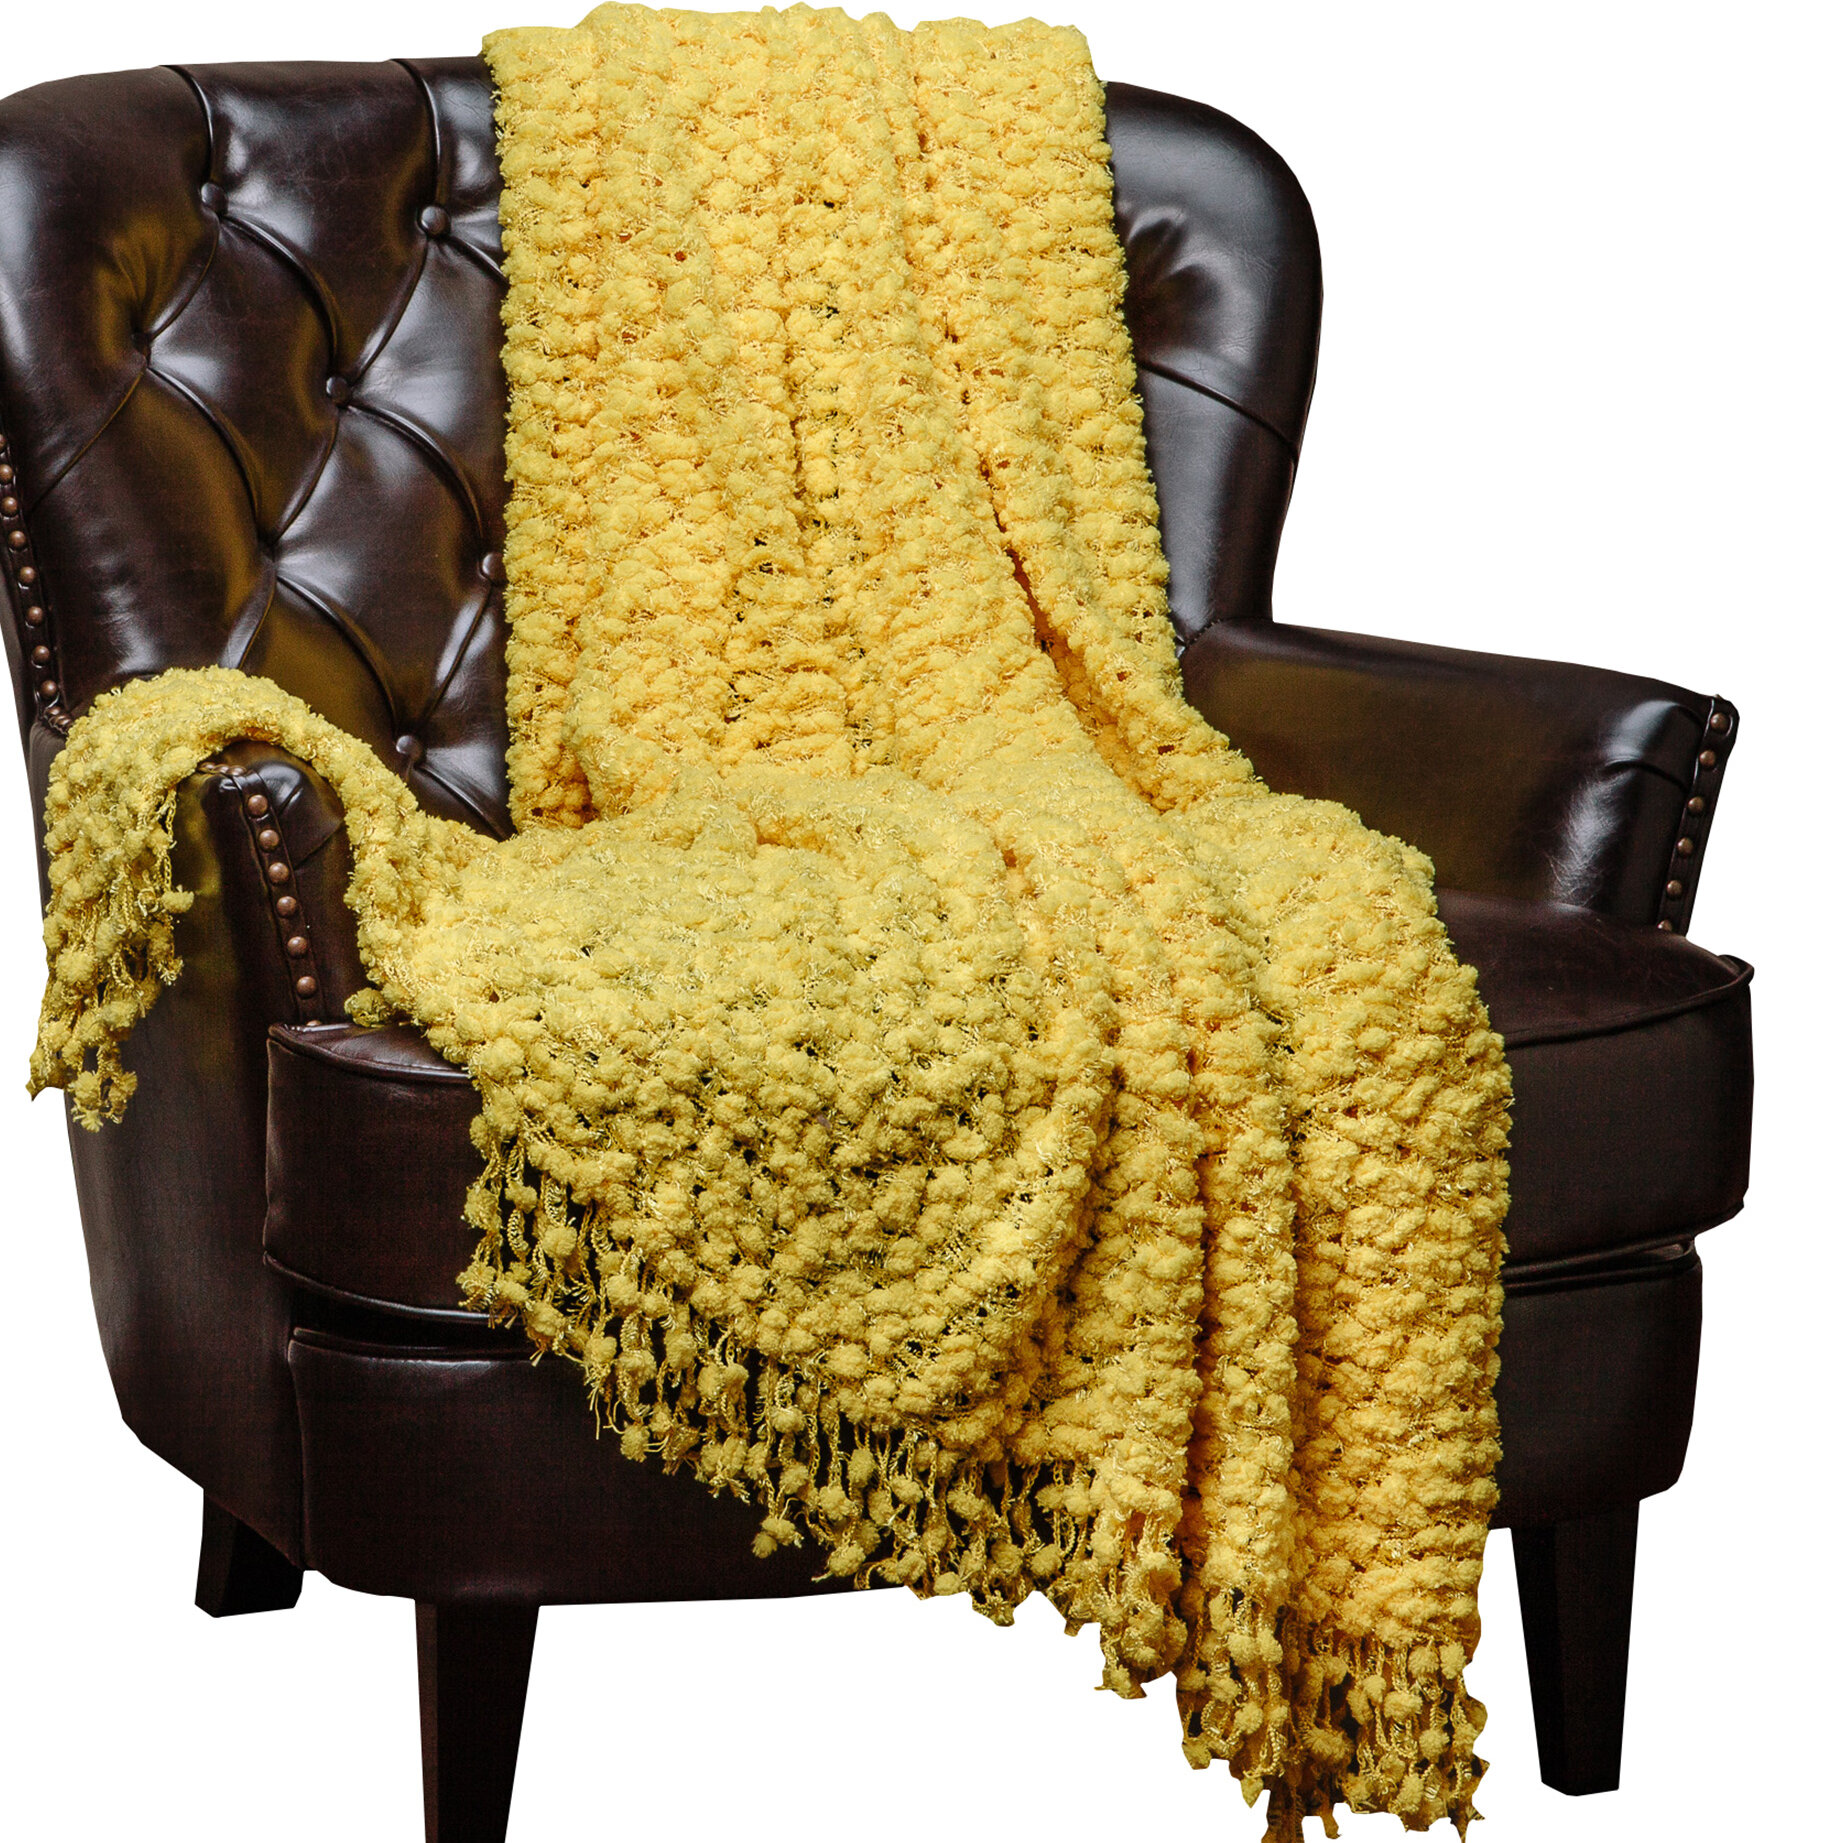 Chanasya Decorative Woven Popcorn Texture Knit Throw & Reviews | Wayfair